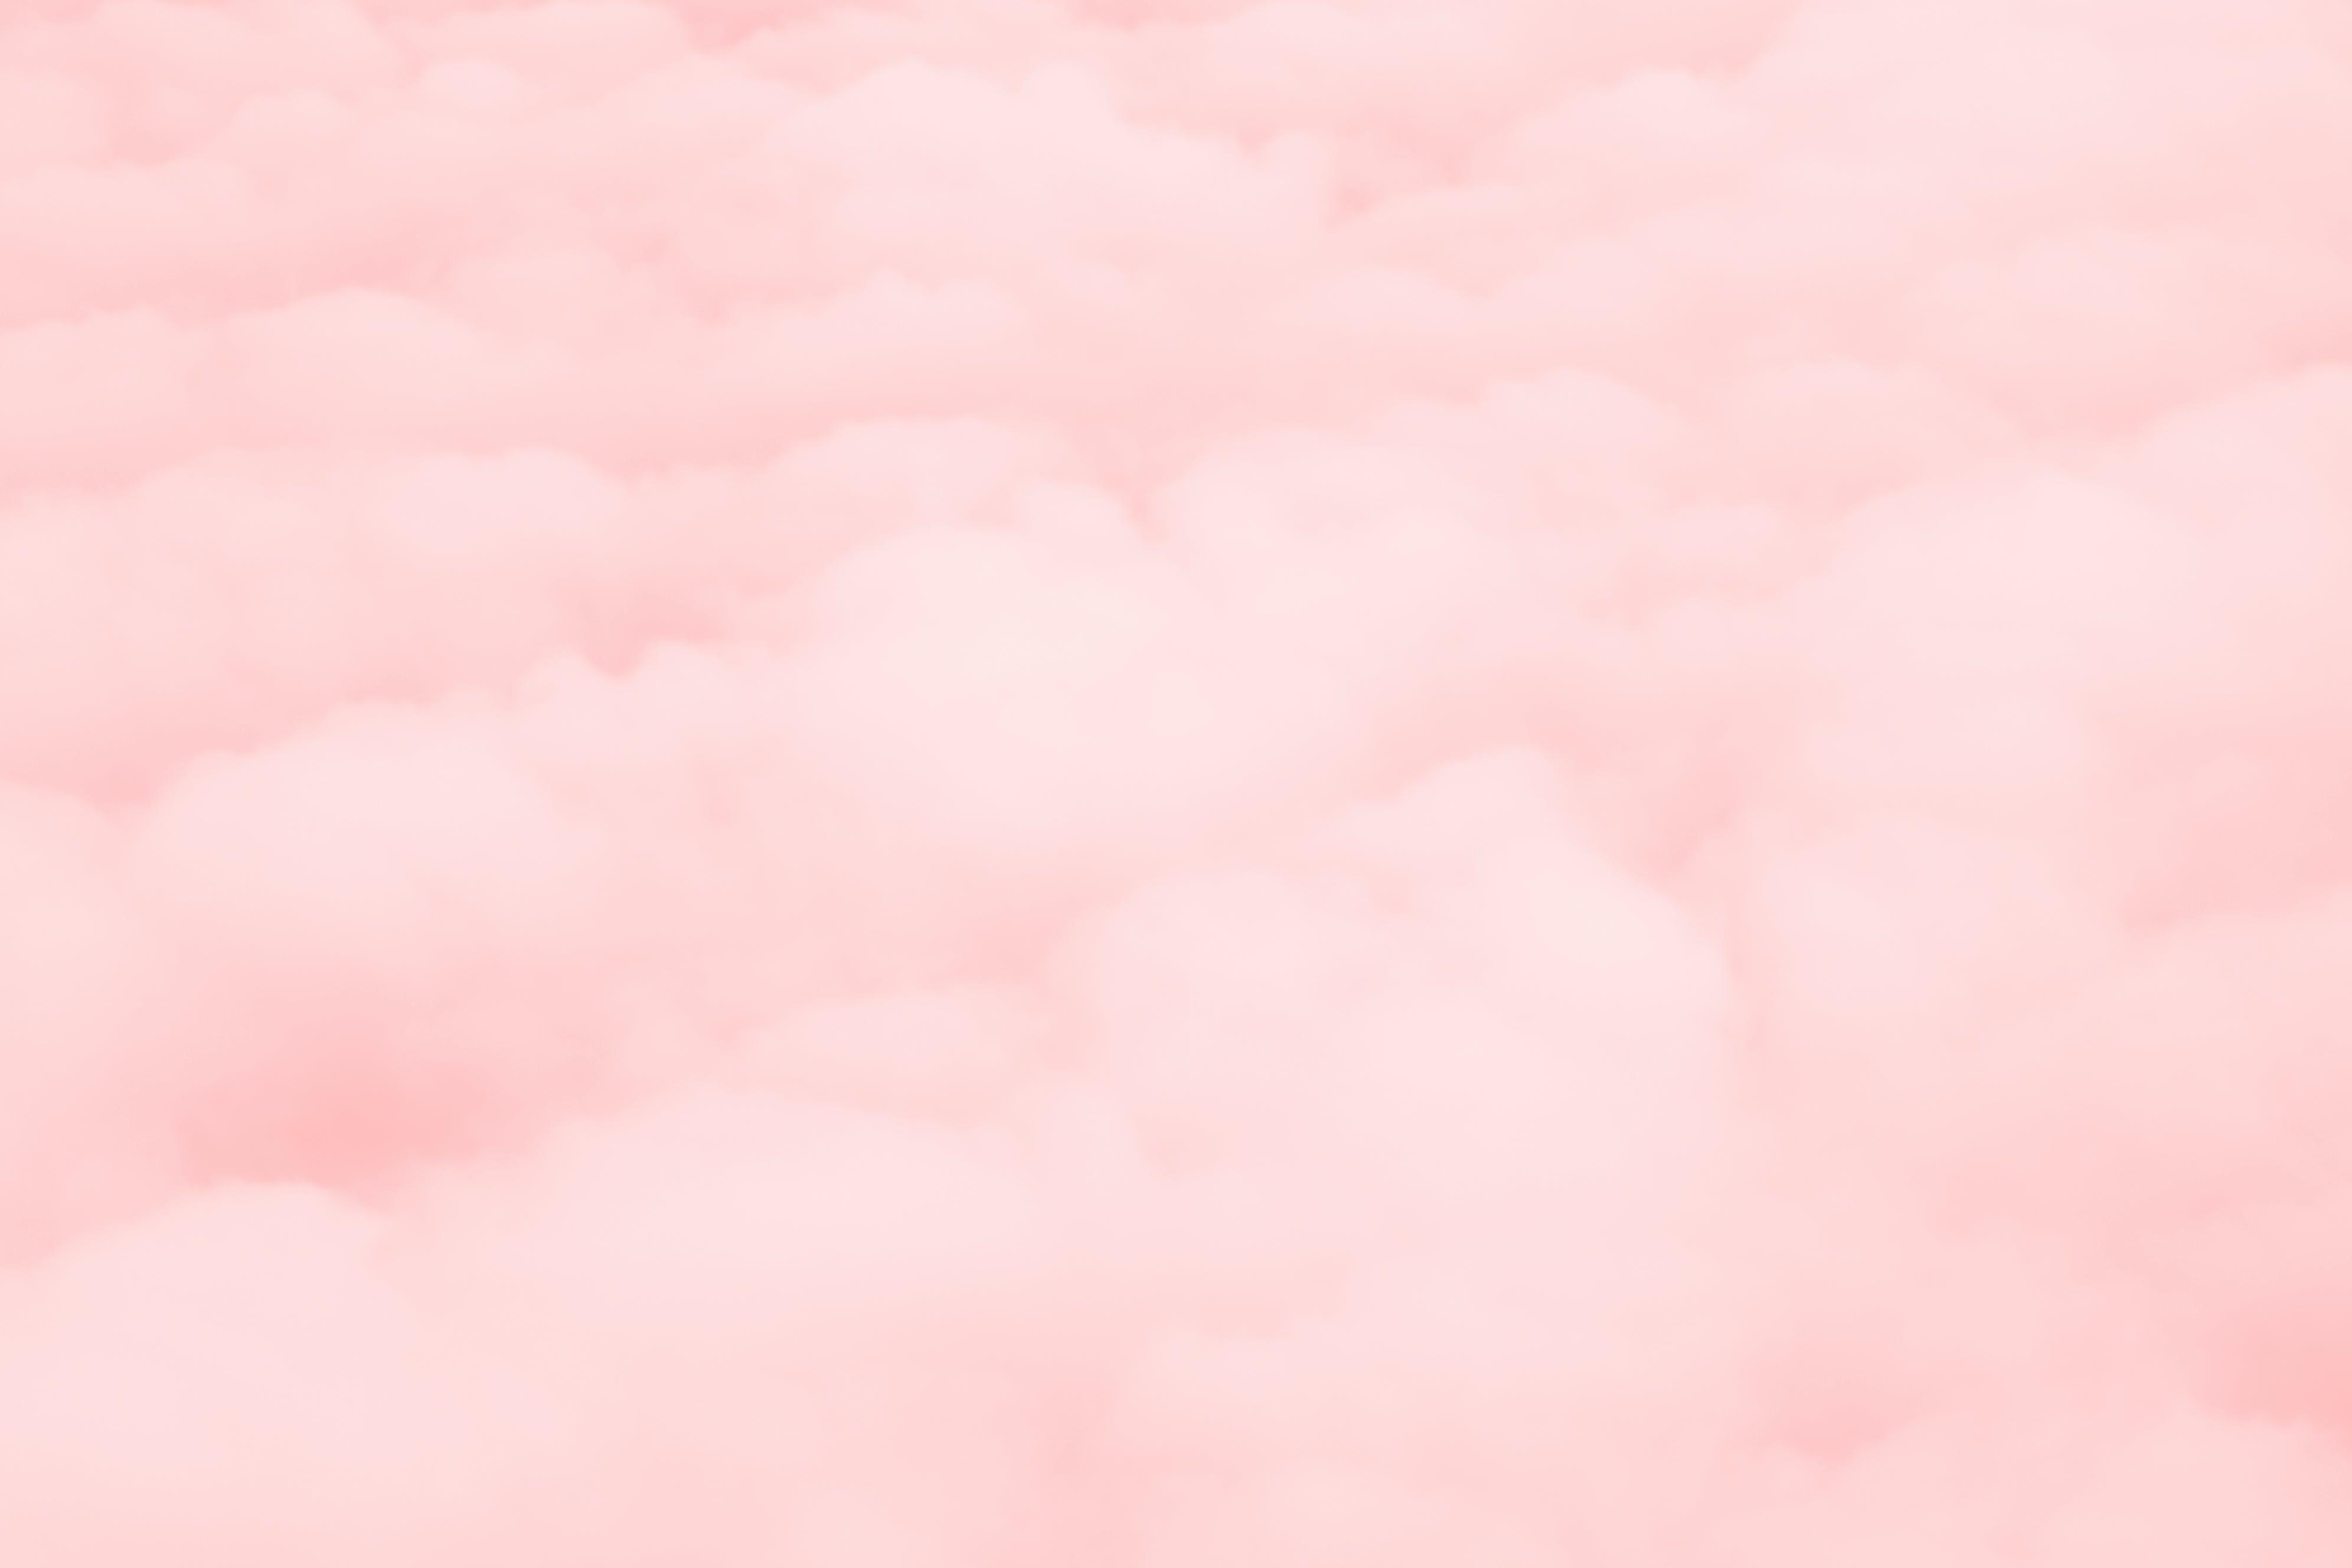 Kostenloses Stock Foto zu design, farbe, glatt, hd wallpaper